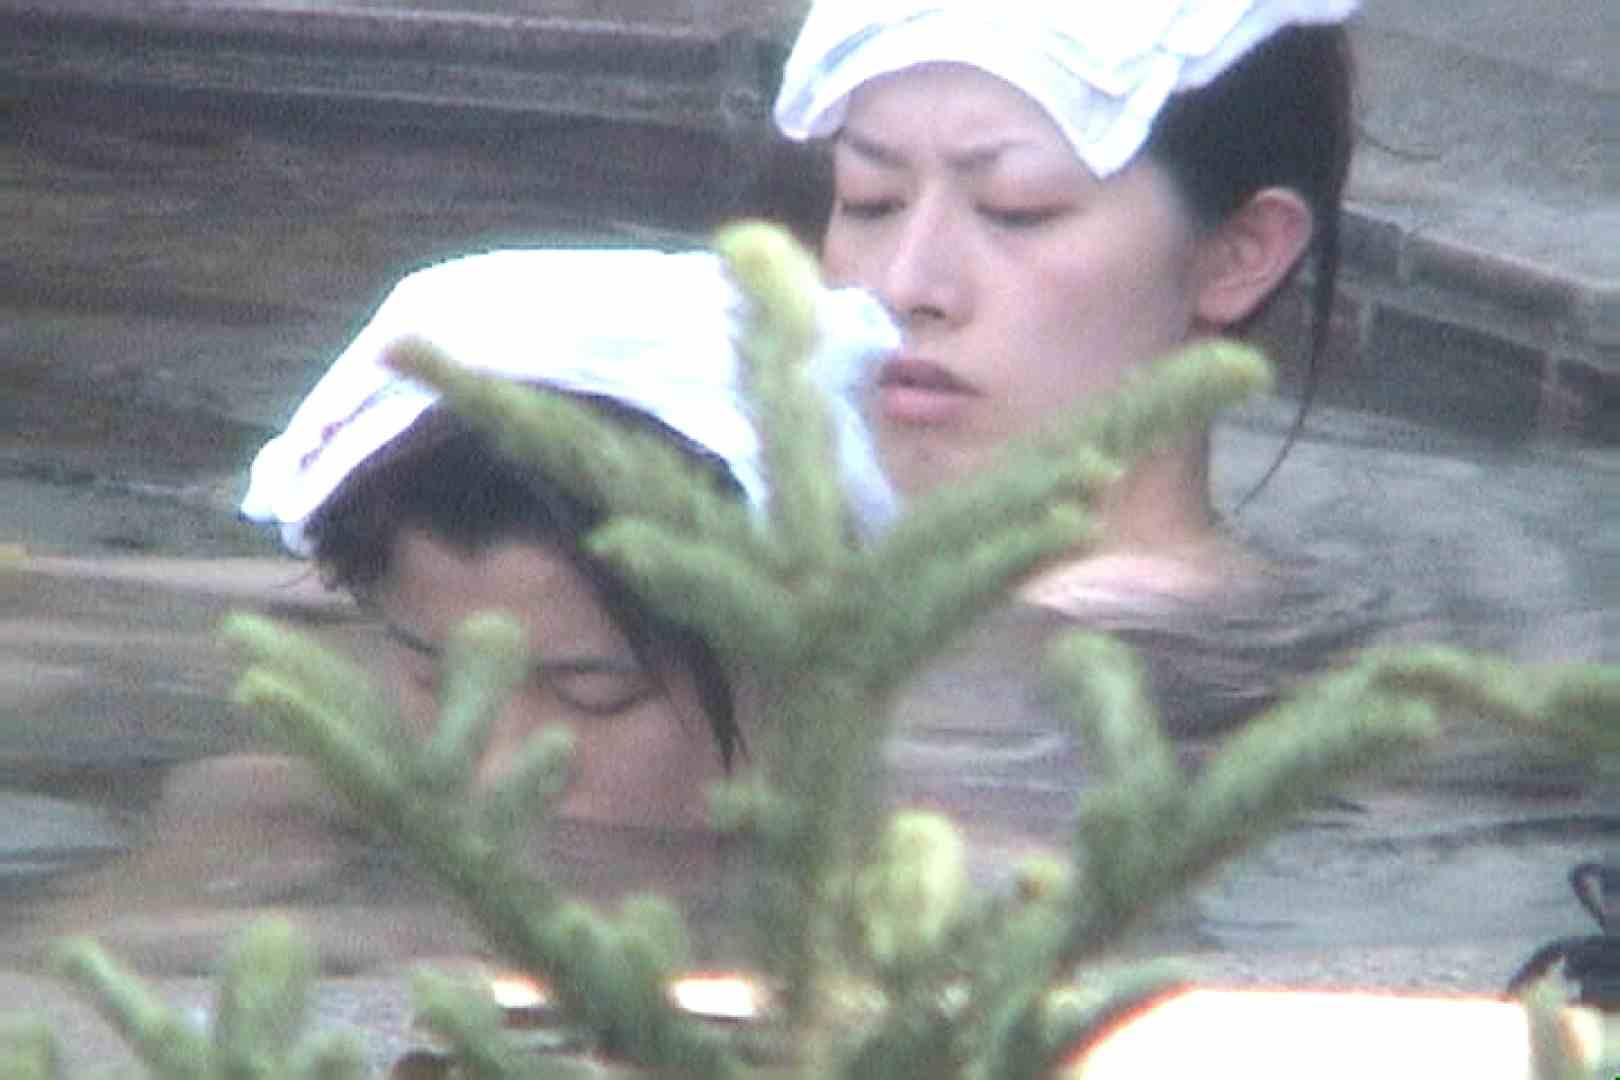 Aquaな露天風呂Vol.80【VIP限定】 盗撮 | HなOL  66pic 54